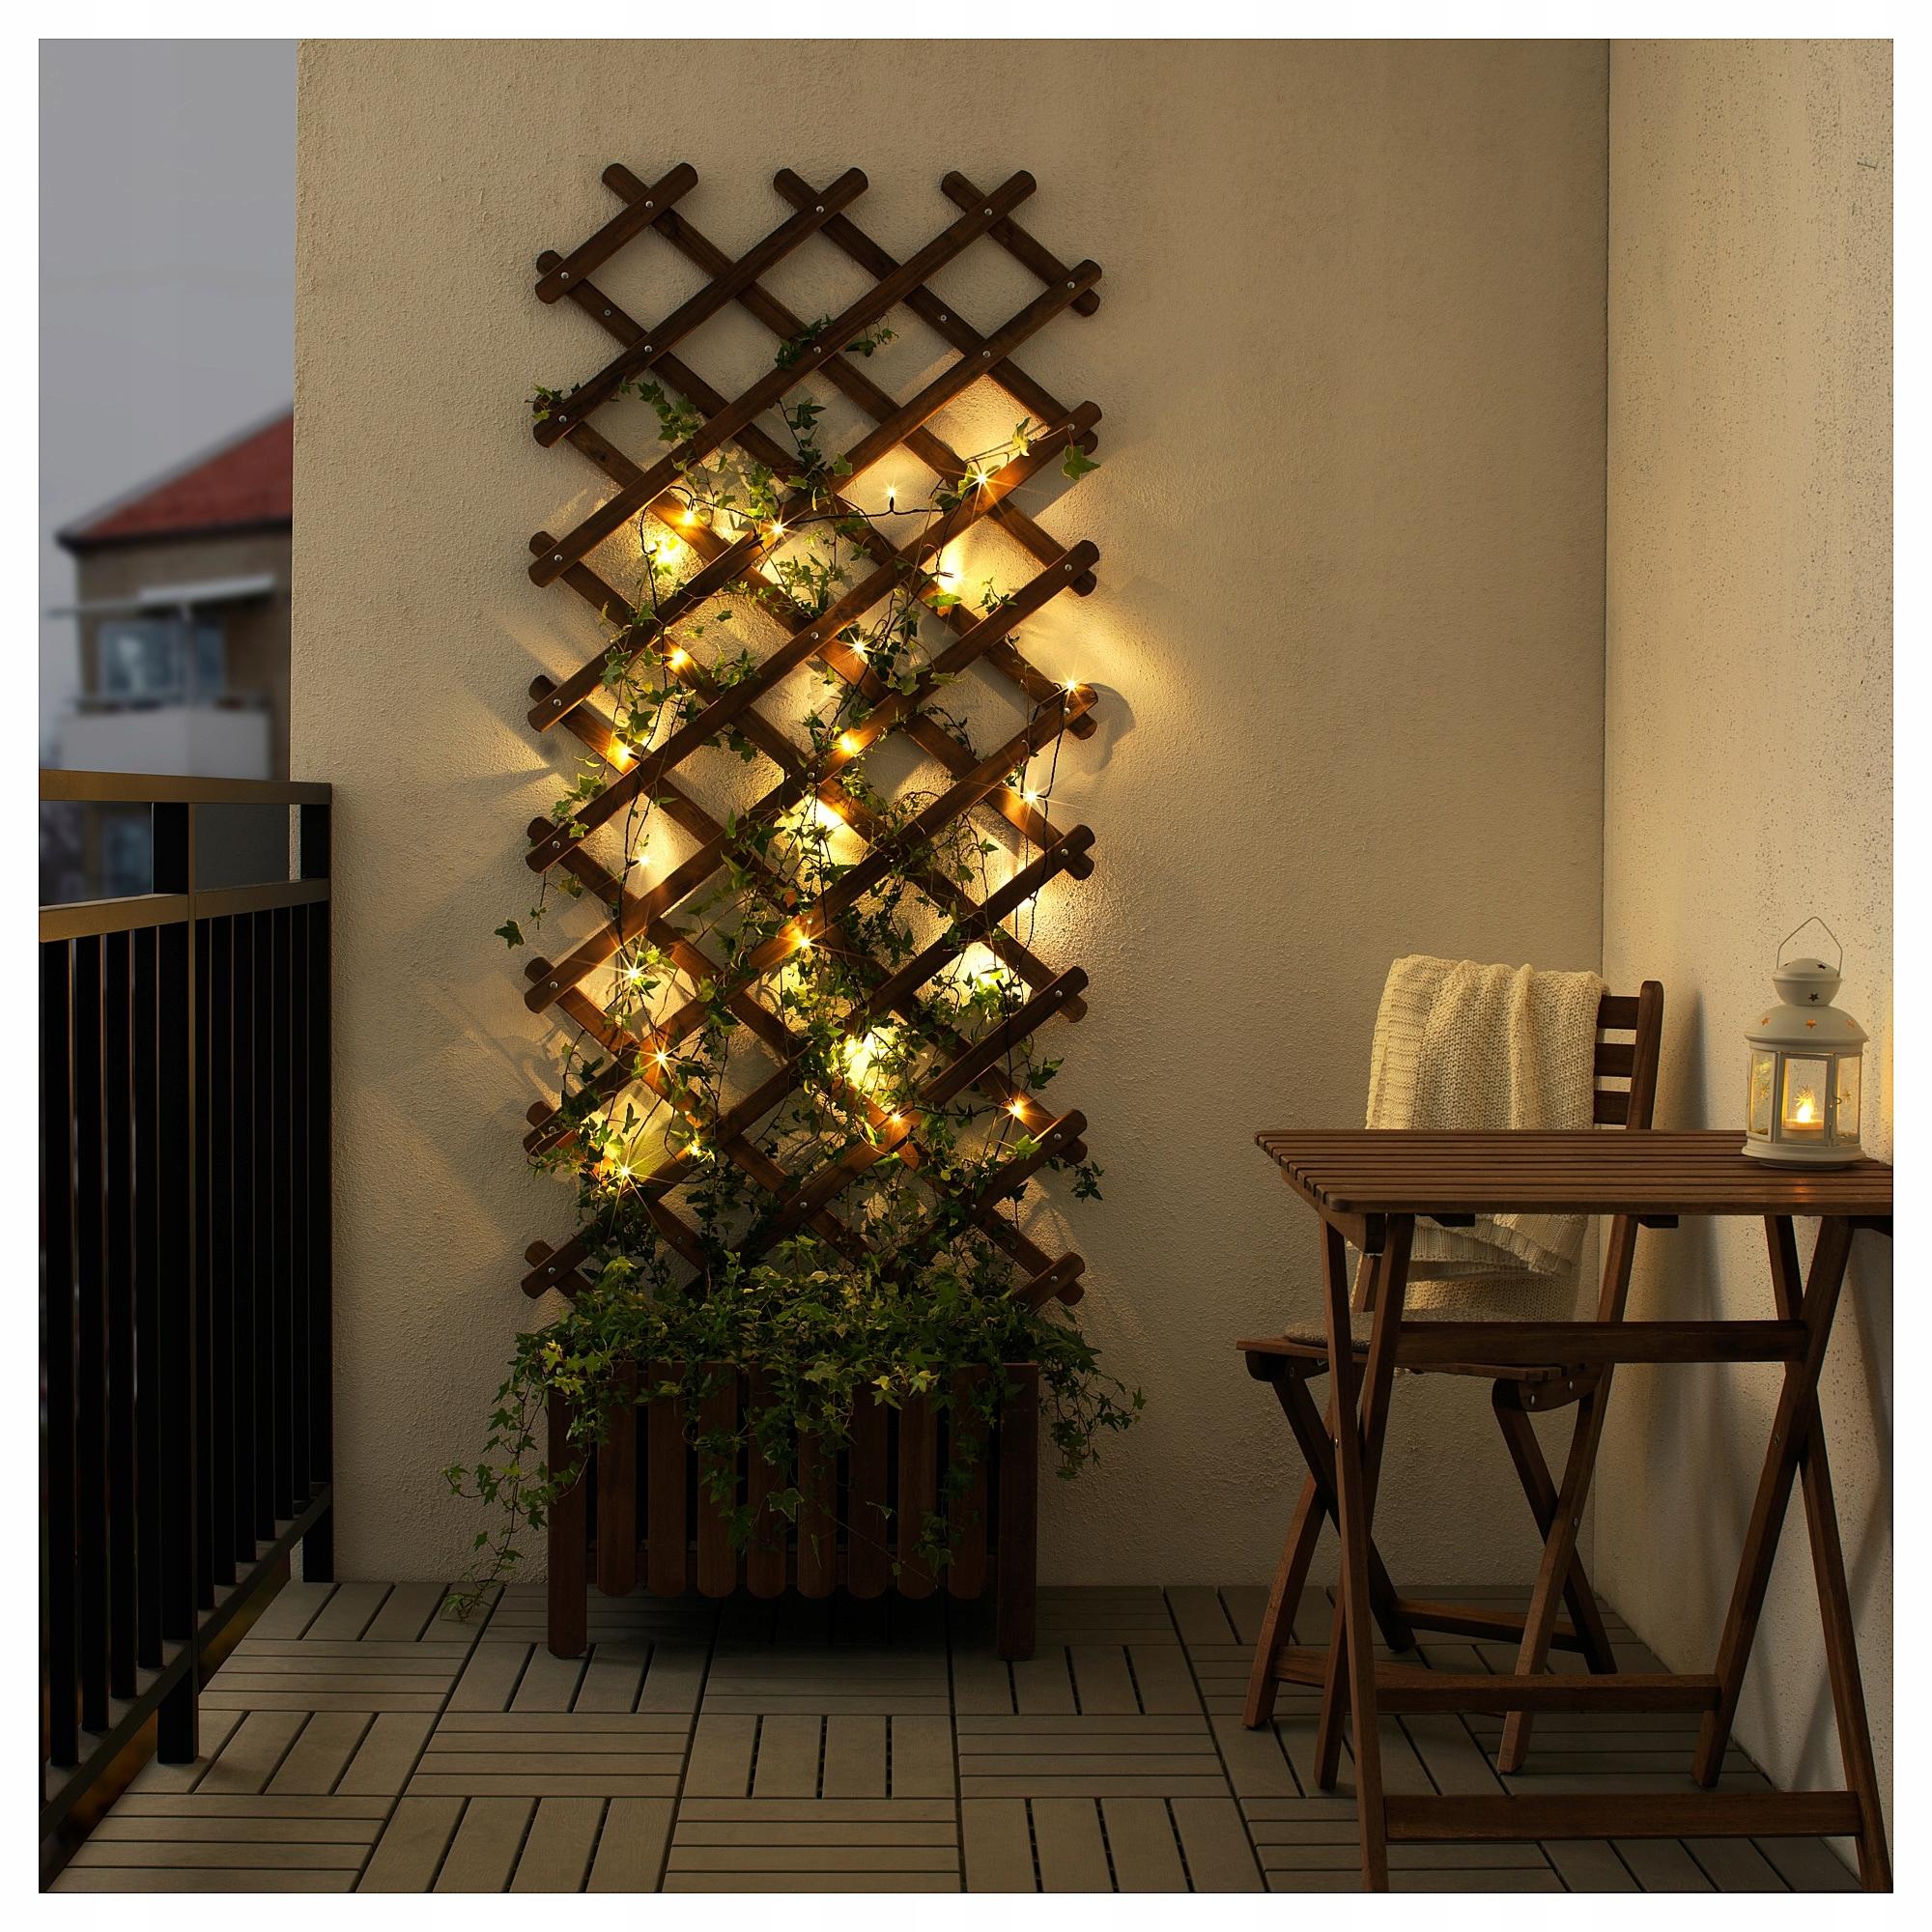 Ikea Ledljus Lampki Zewnętrzne Led 24 święta 7675701783